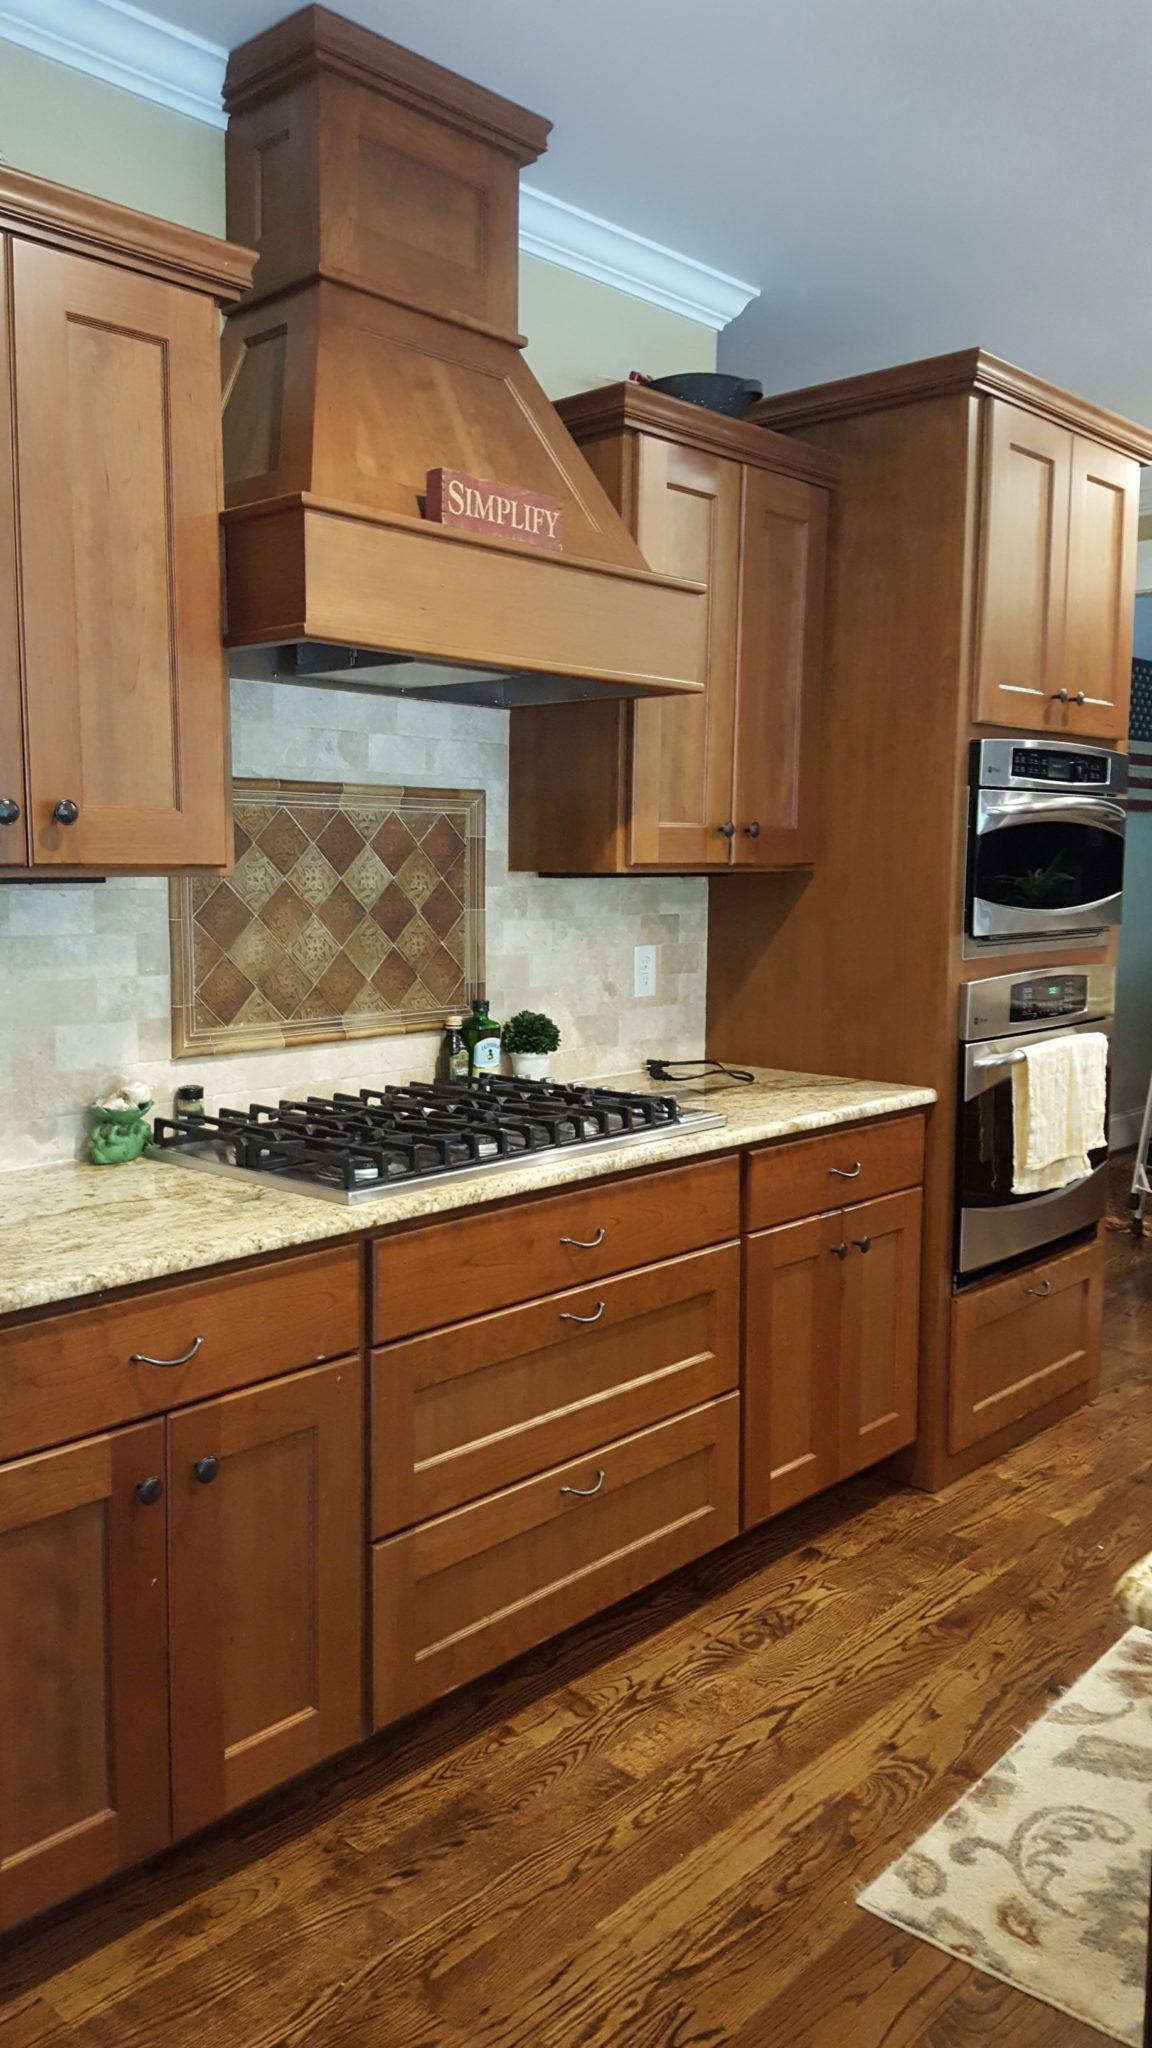 Dover White Kitchen - 2 Cabinet Girls